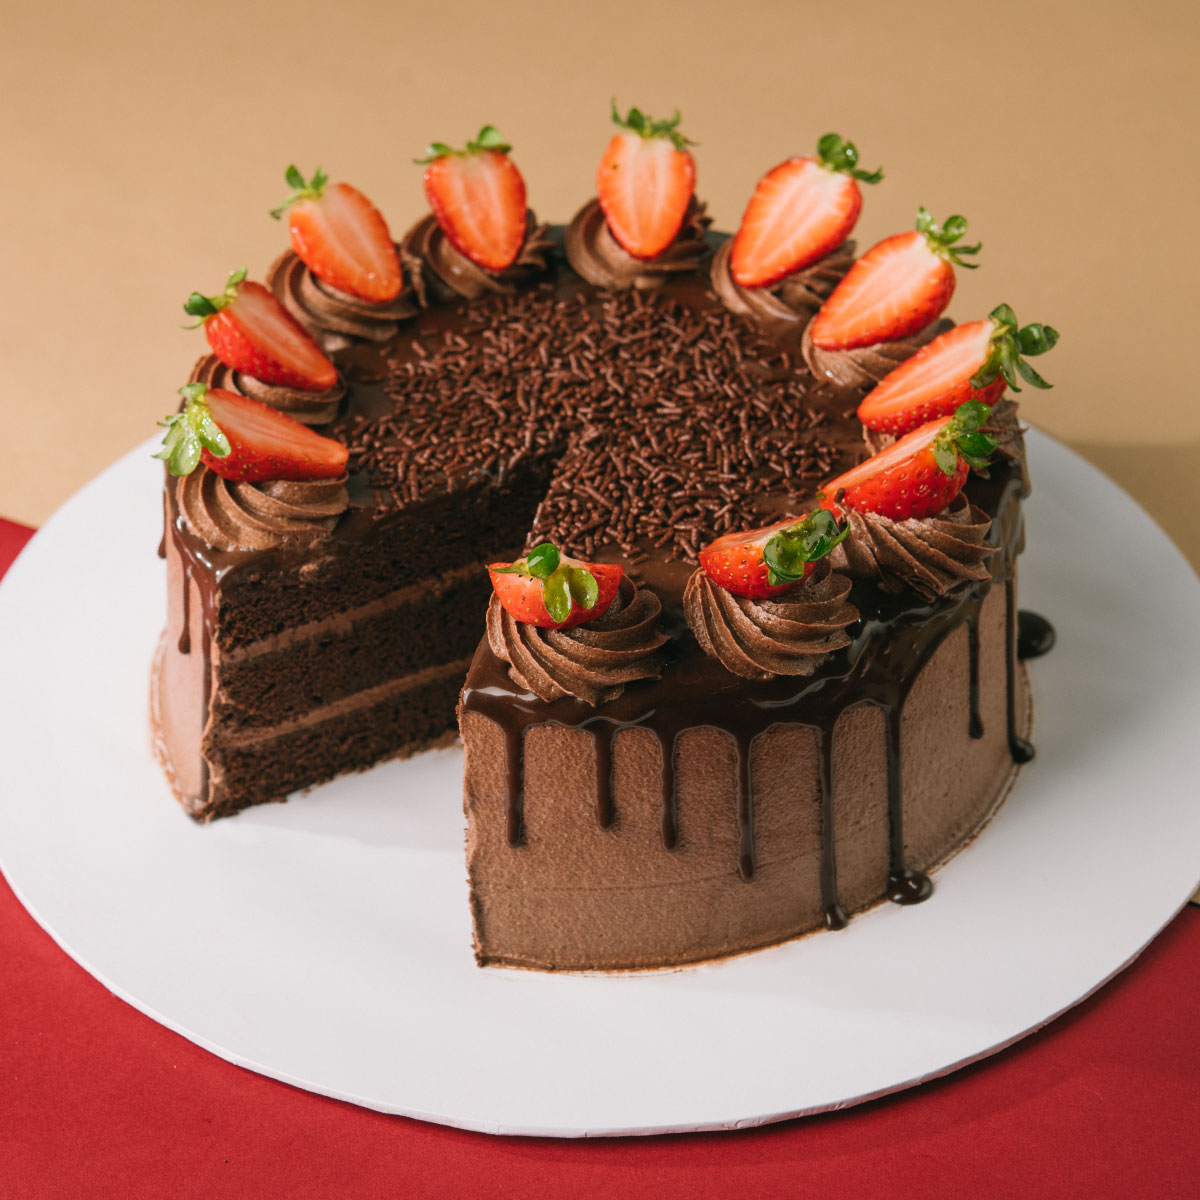 Chocolate Cake with Strawberry - 1kg